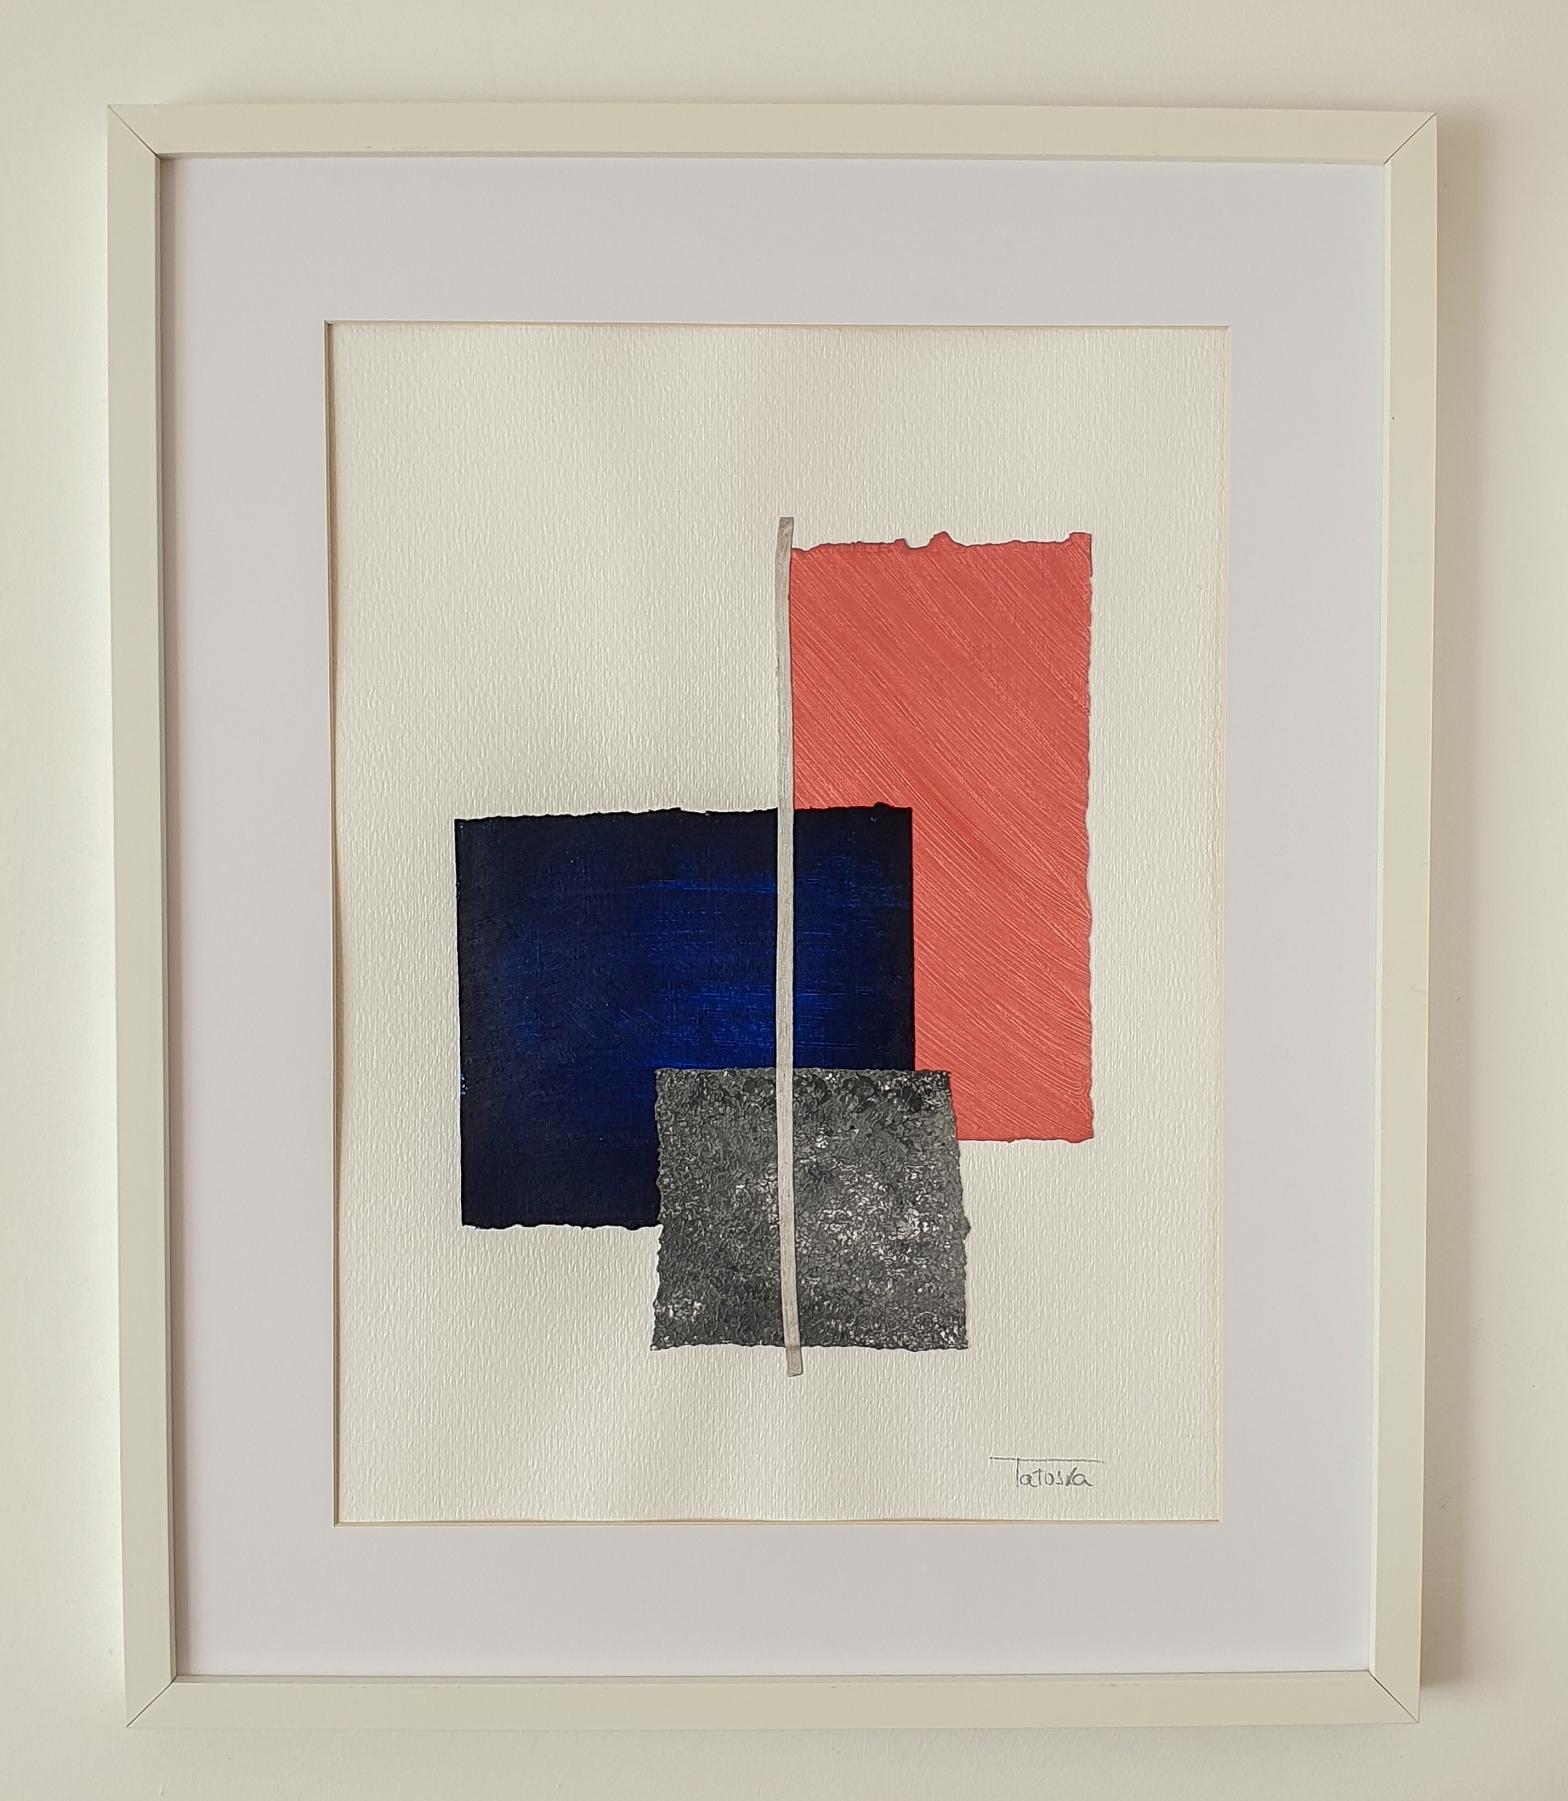 "Cuadro de arte abstracto titulado ""Salmon"" de la artista Tatuska"